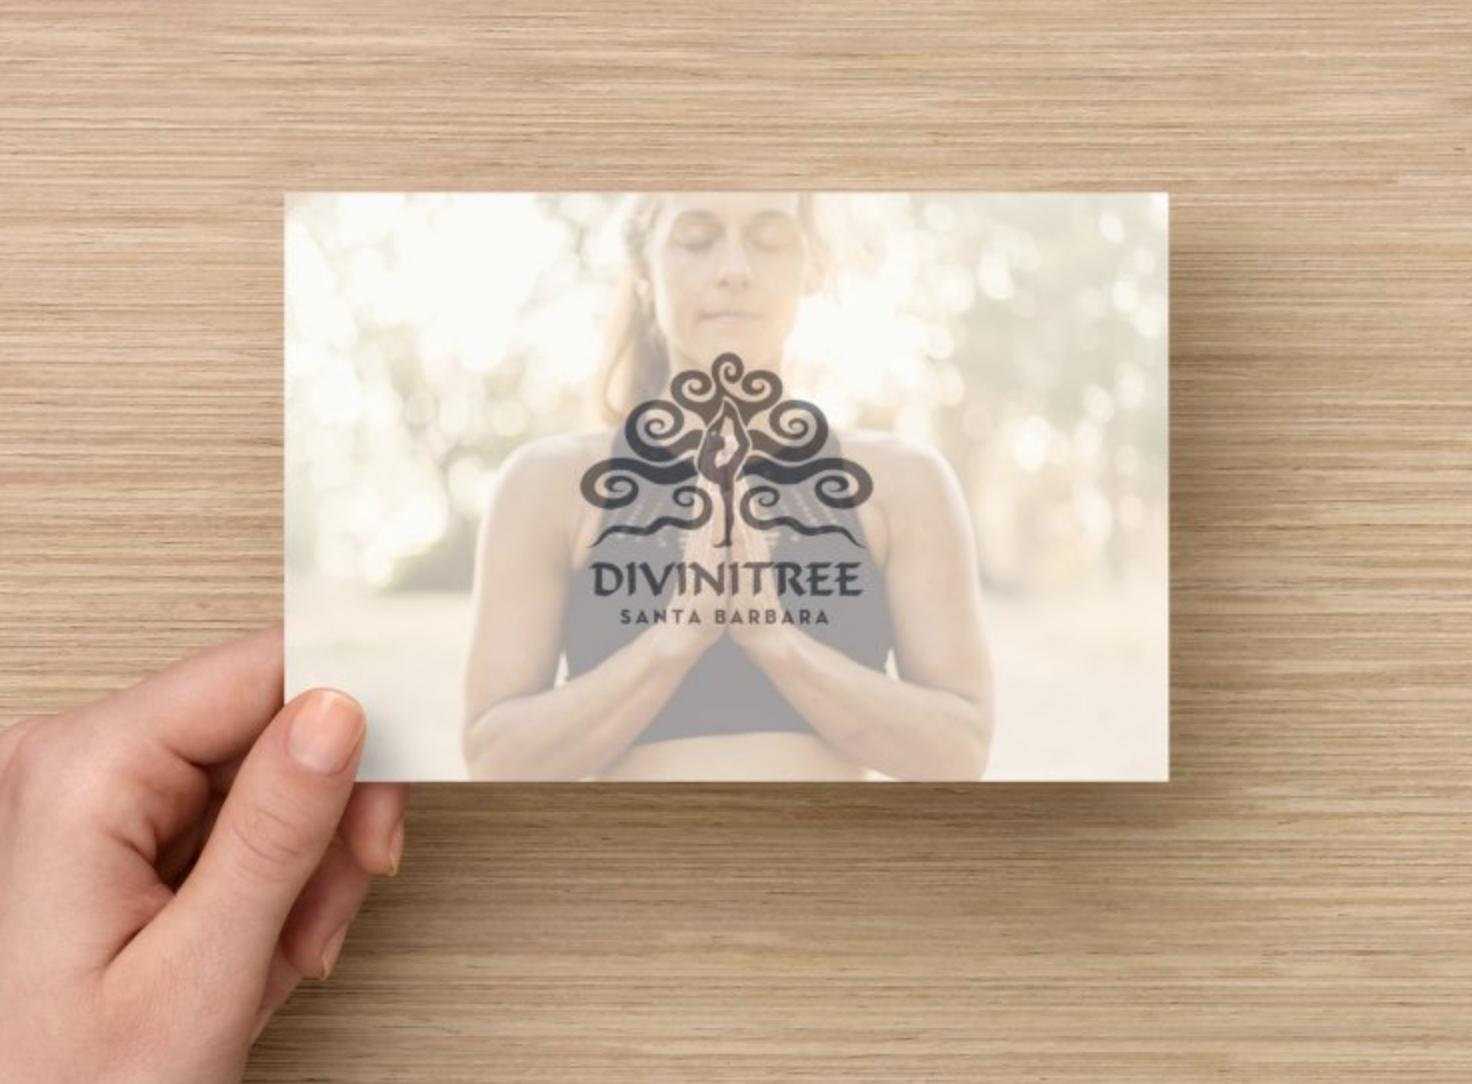 Divinitree Yoga gift card